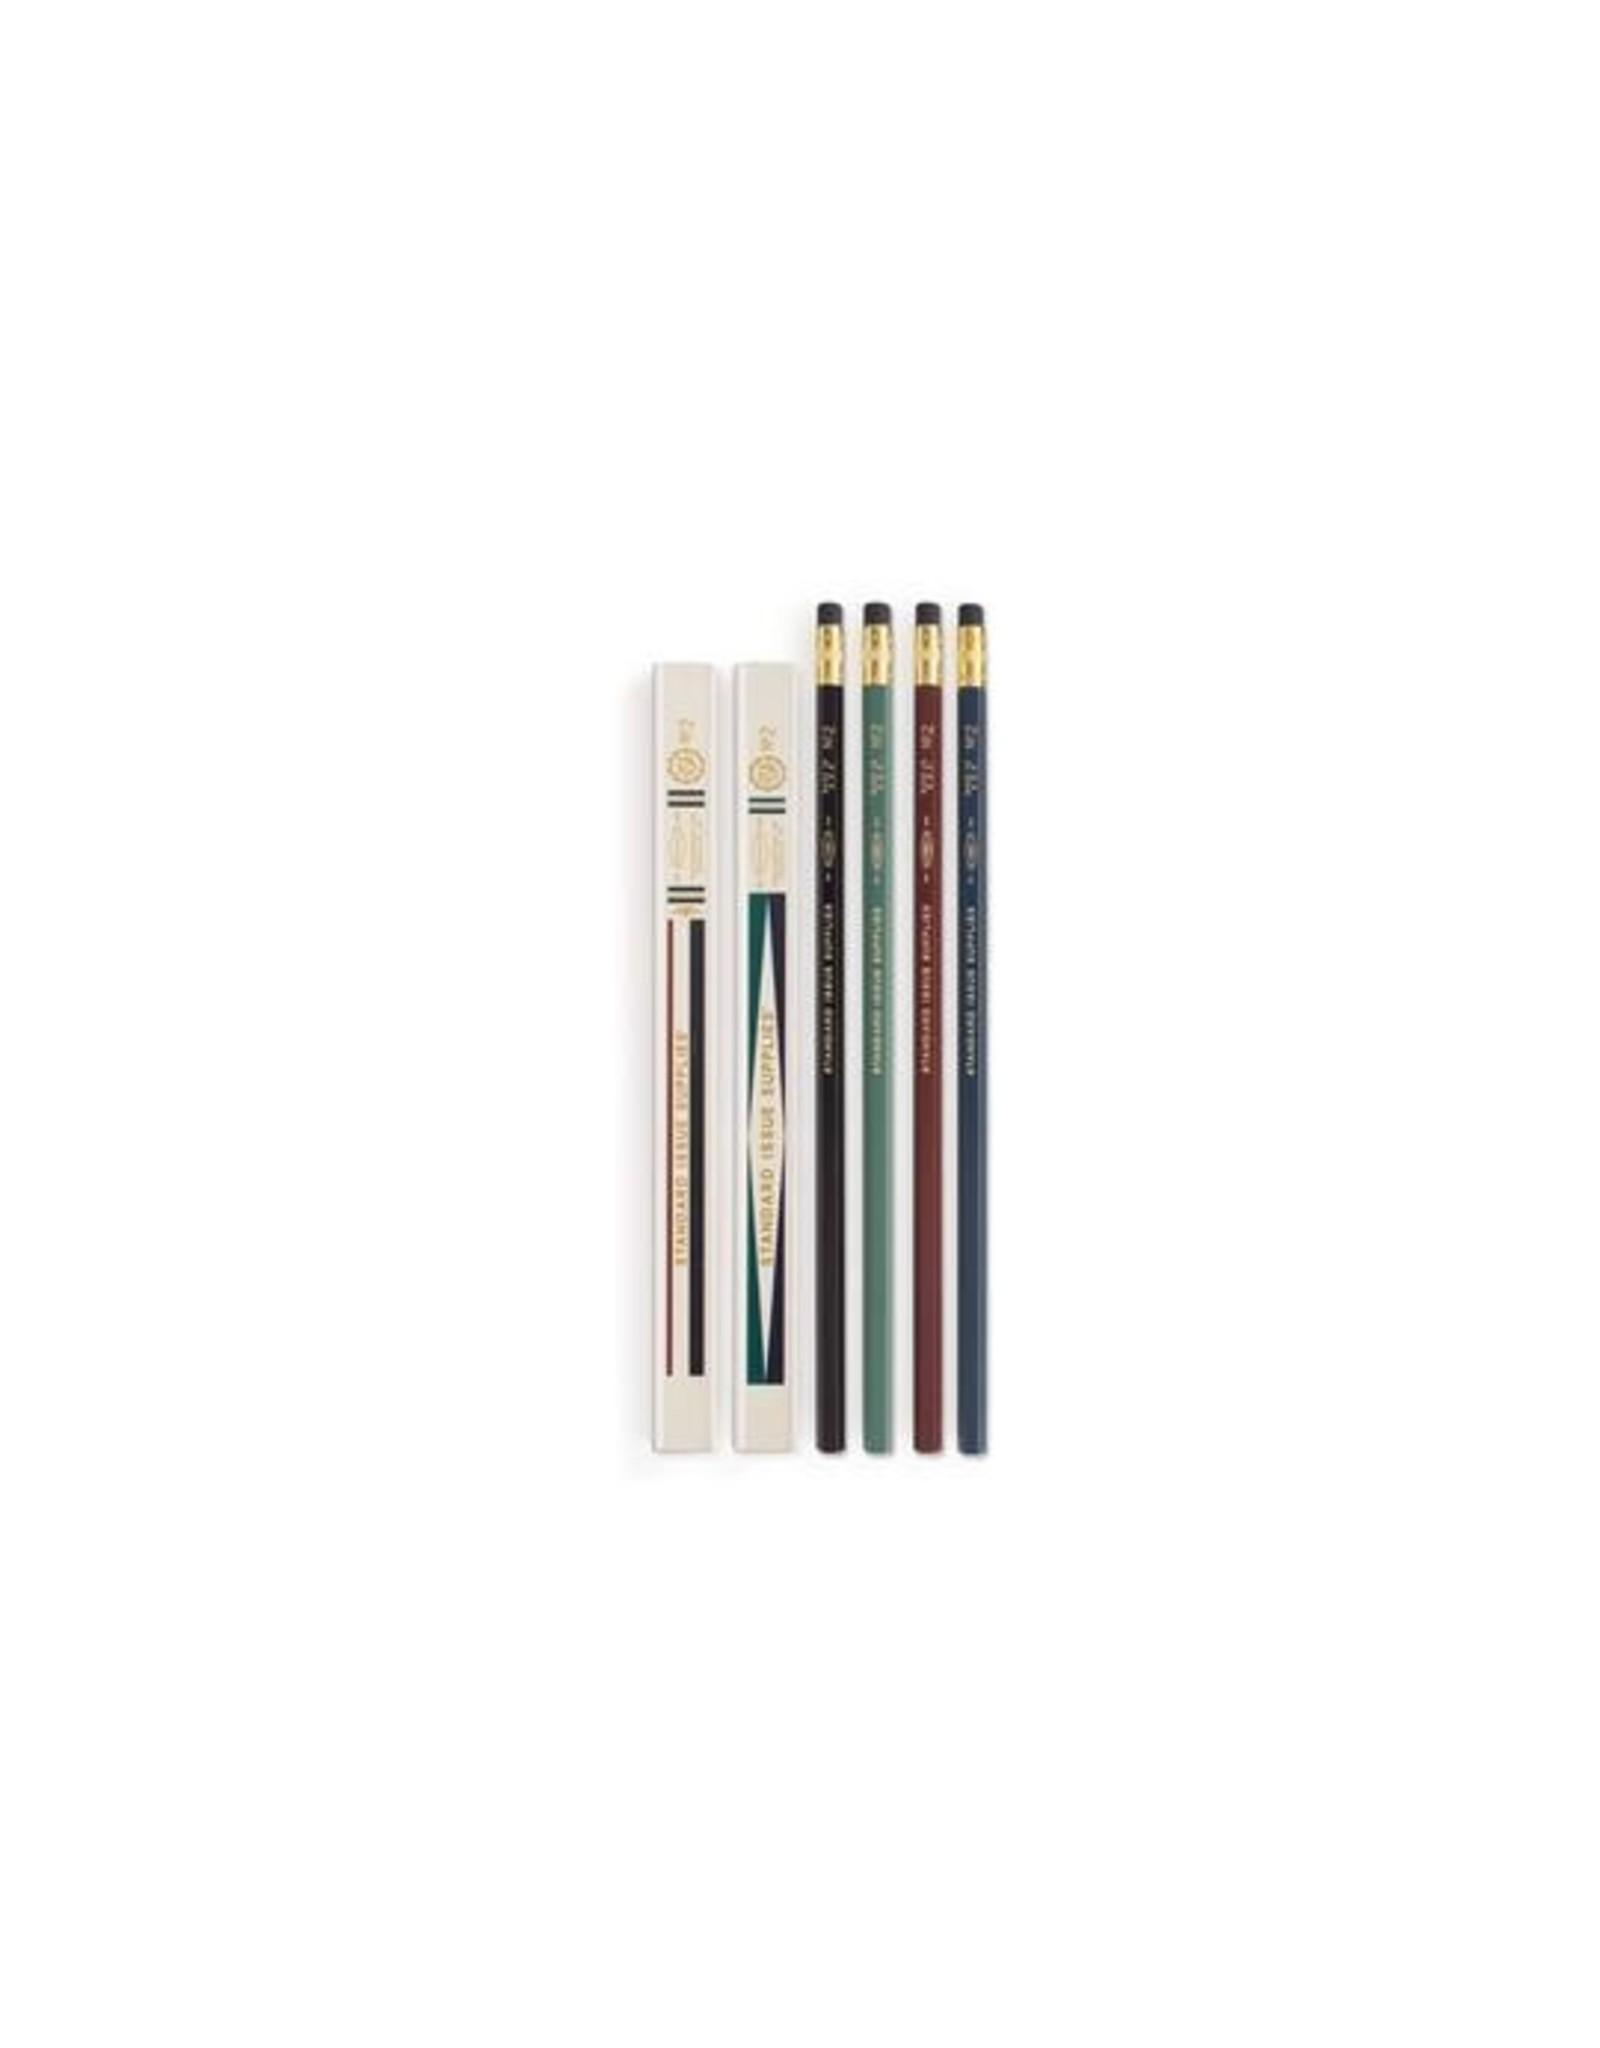 Pencil Set: Standard Issue